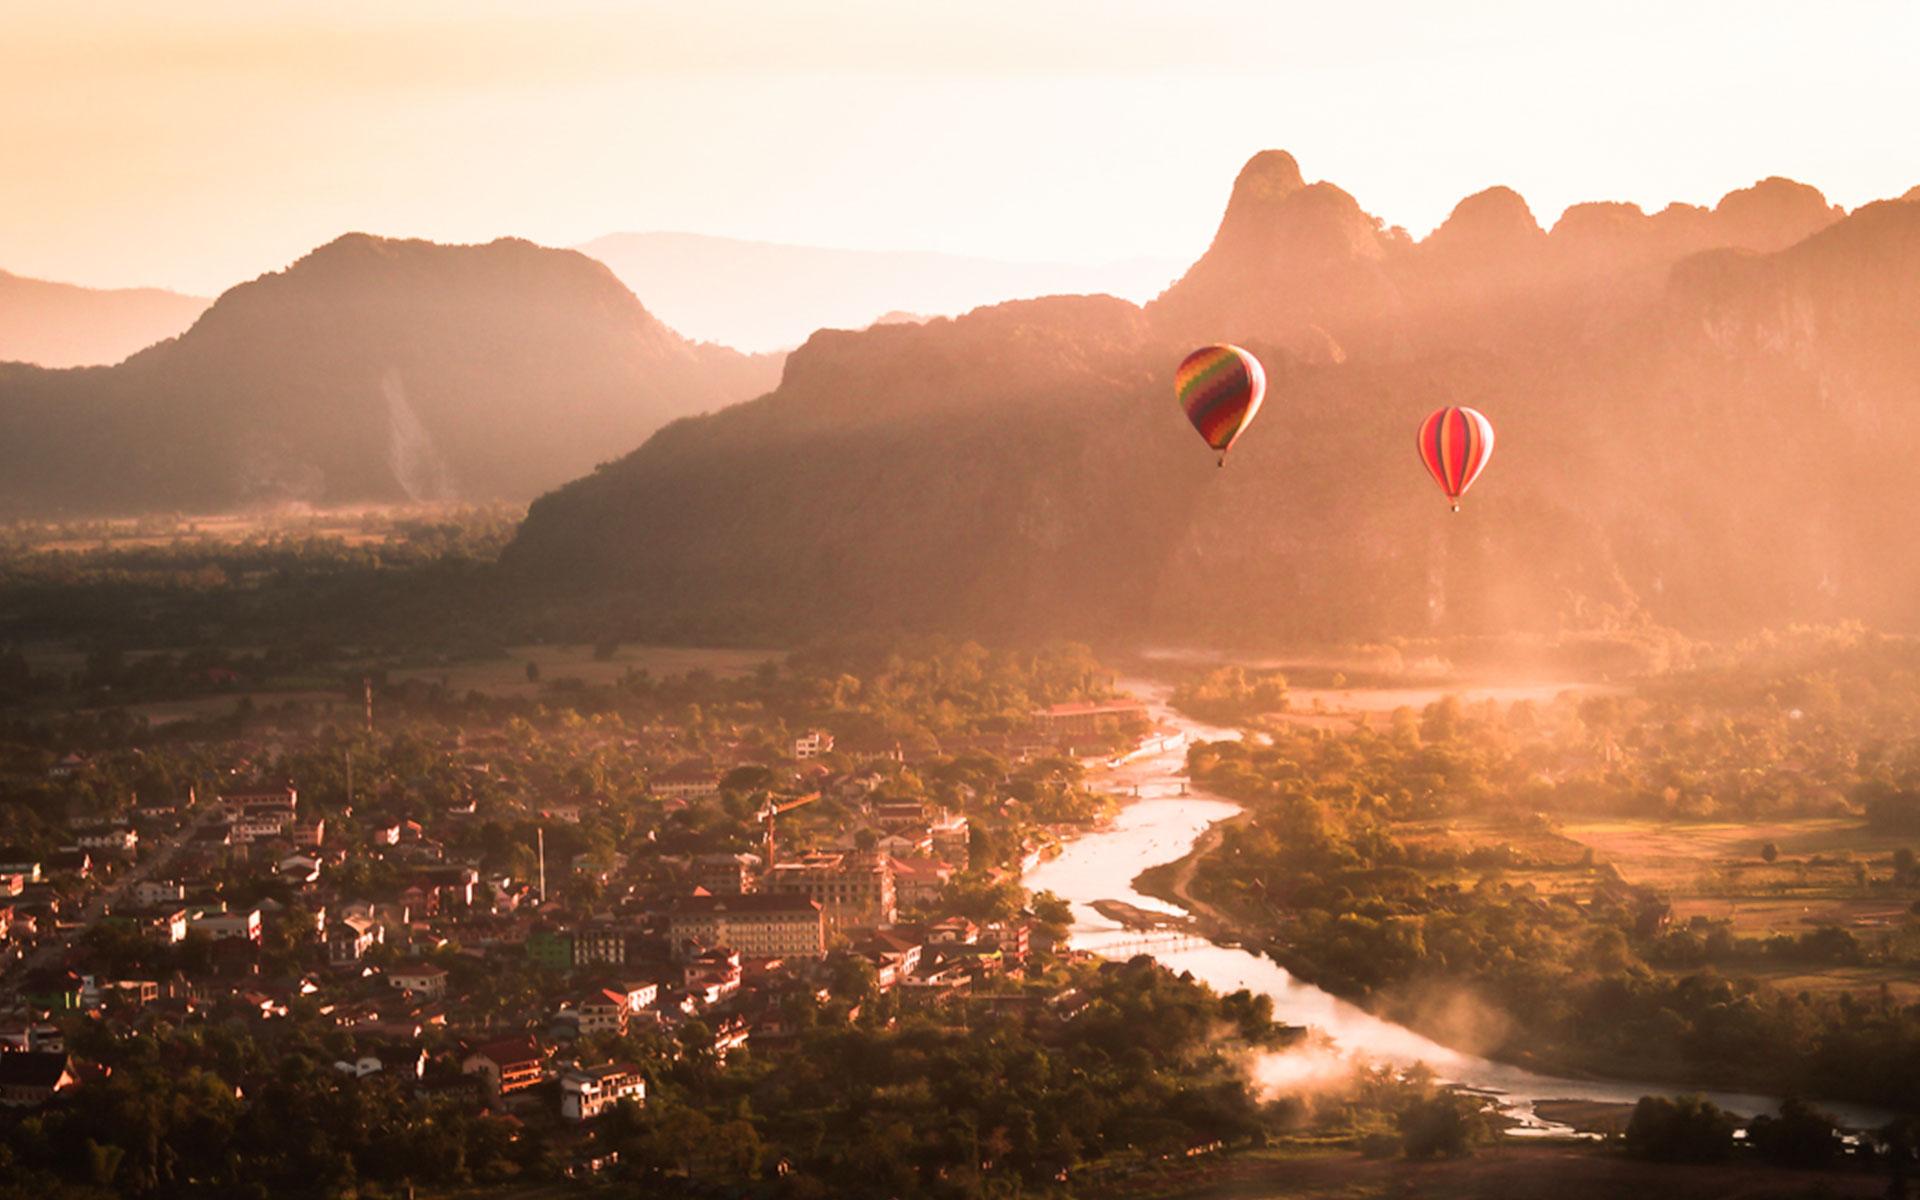 Balloon over Vang Vieng